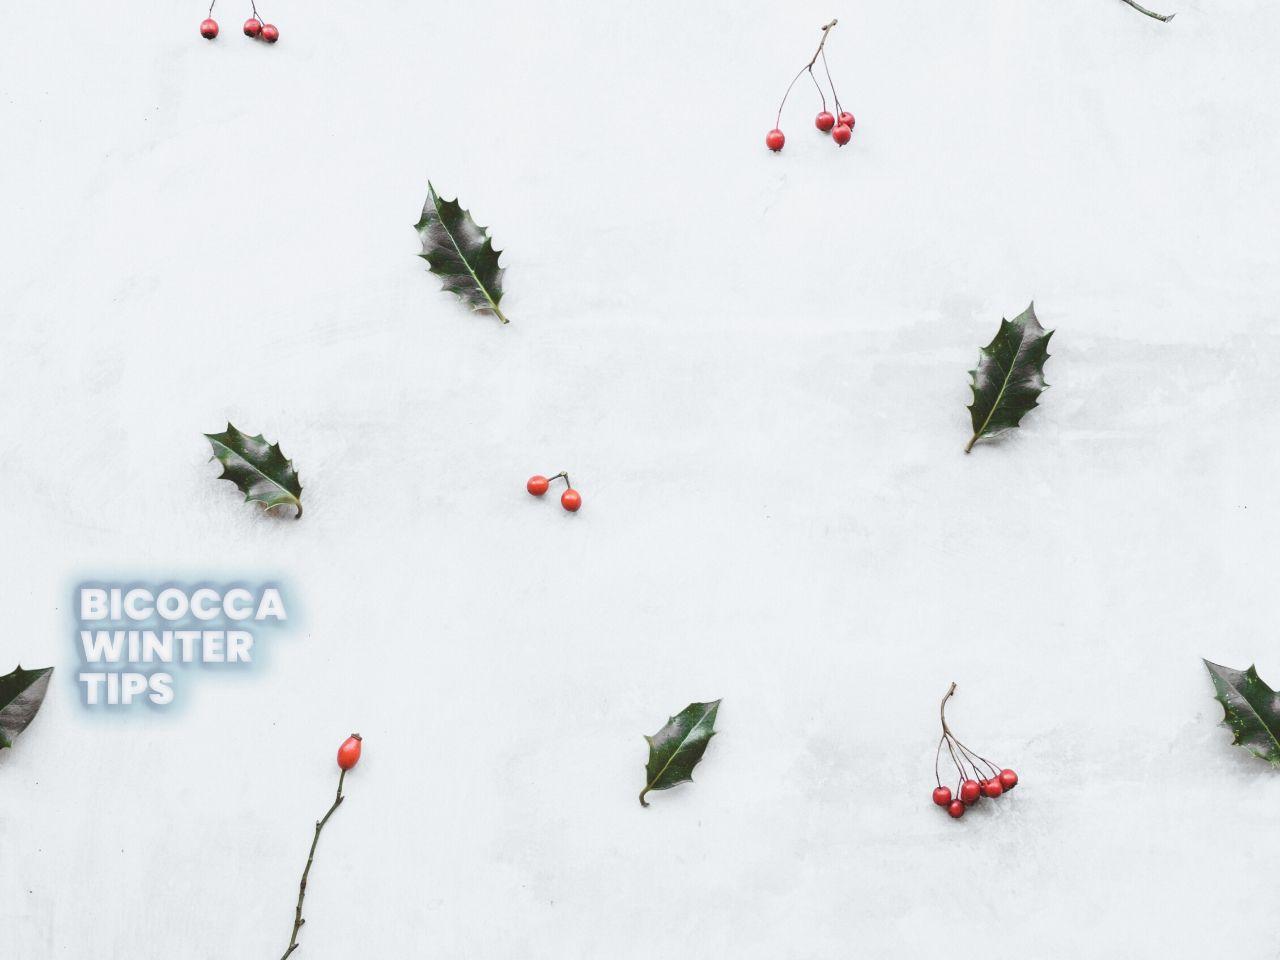 Bicocca Winter Tips